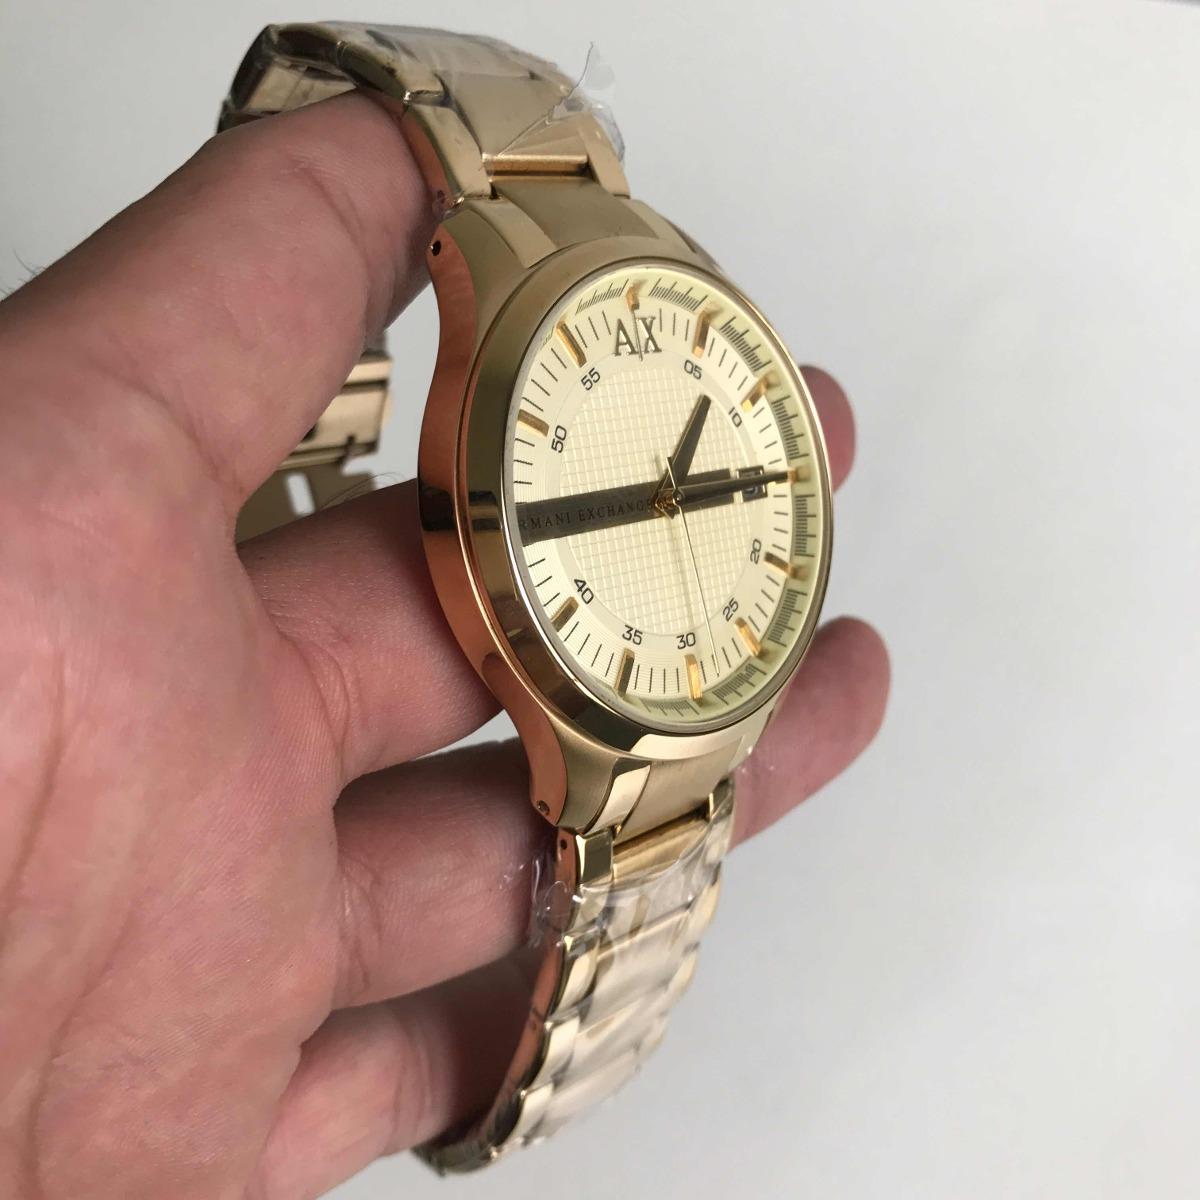 ca8dadbbc6a Carregando zoom... relógio armani exchange ax-2131 dourado.